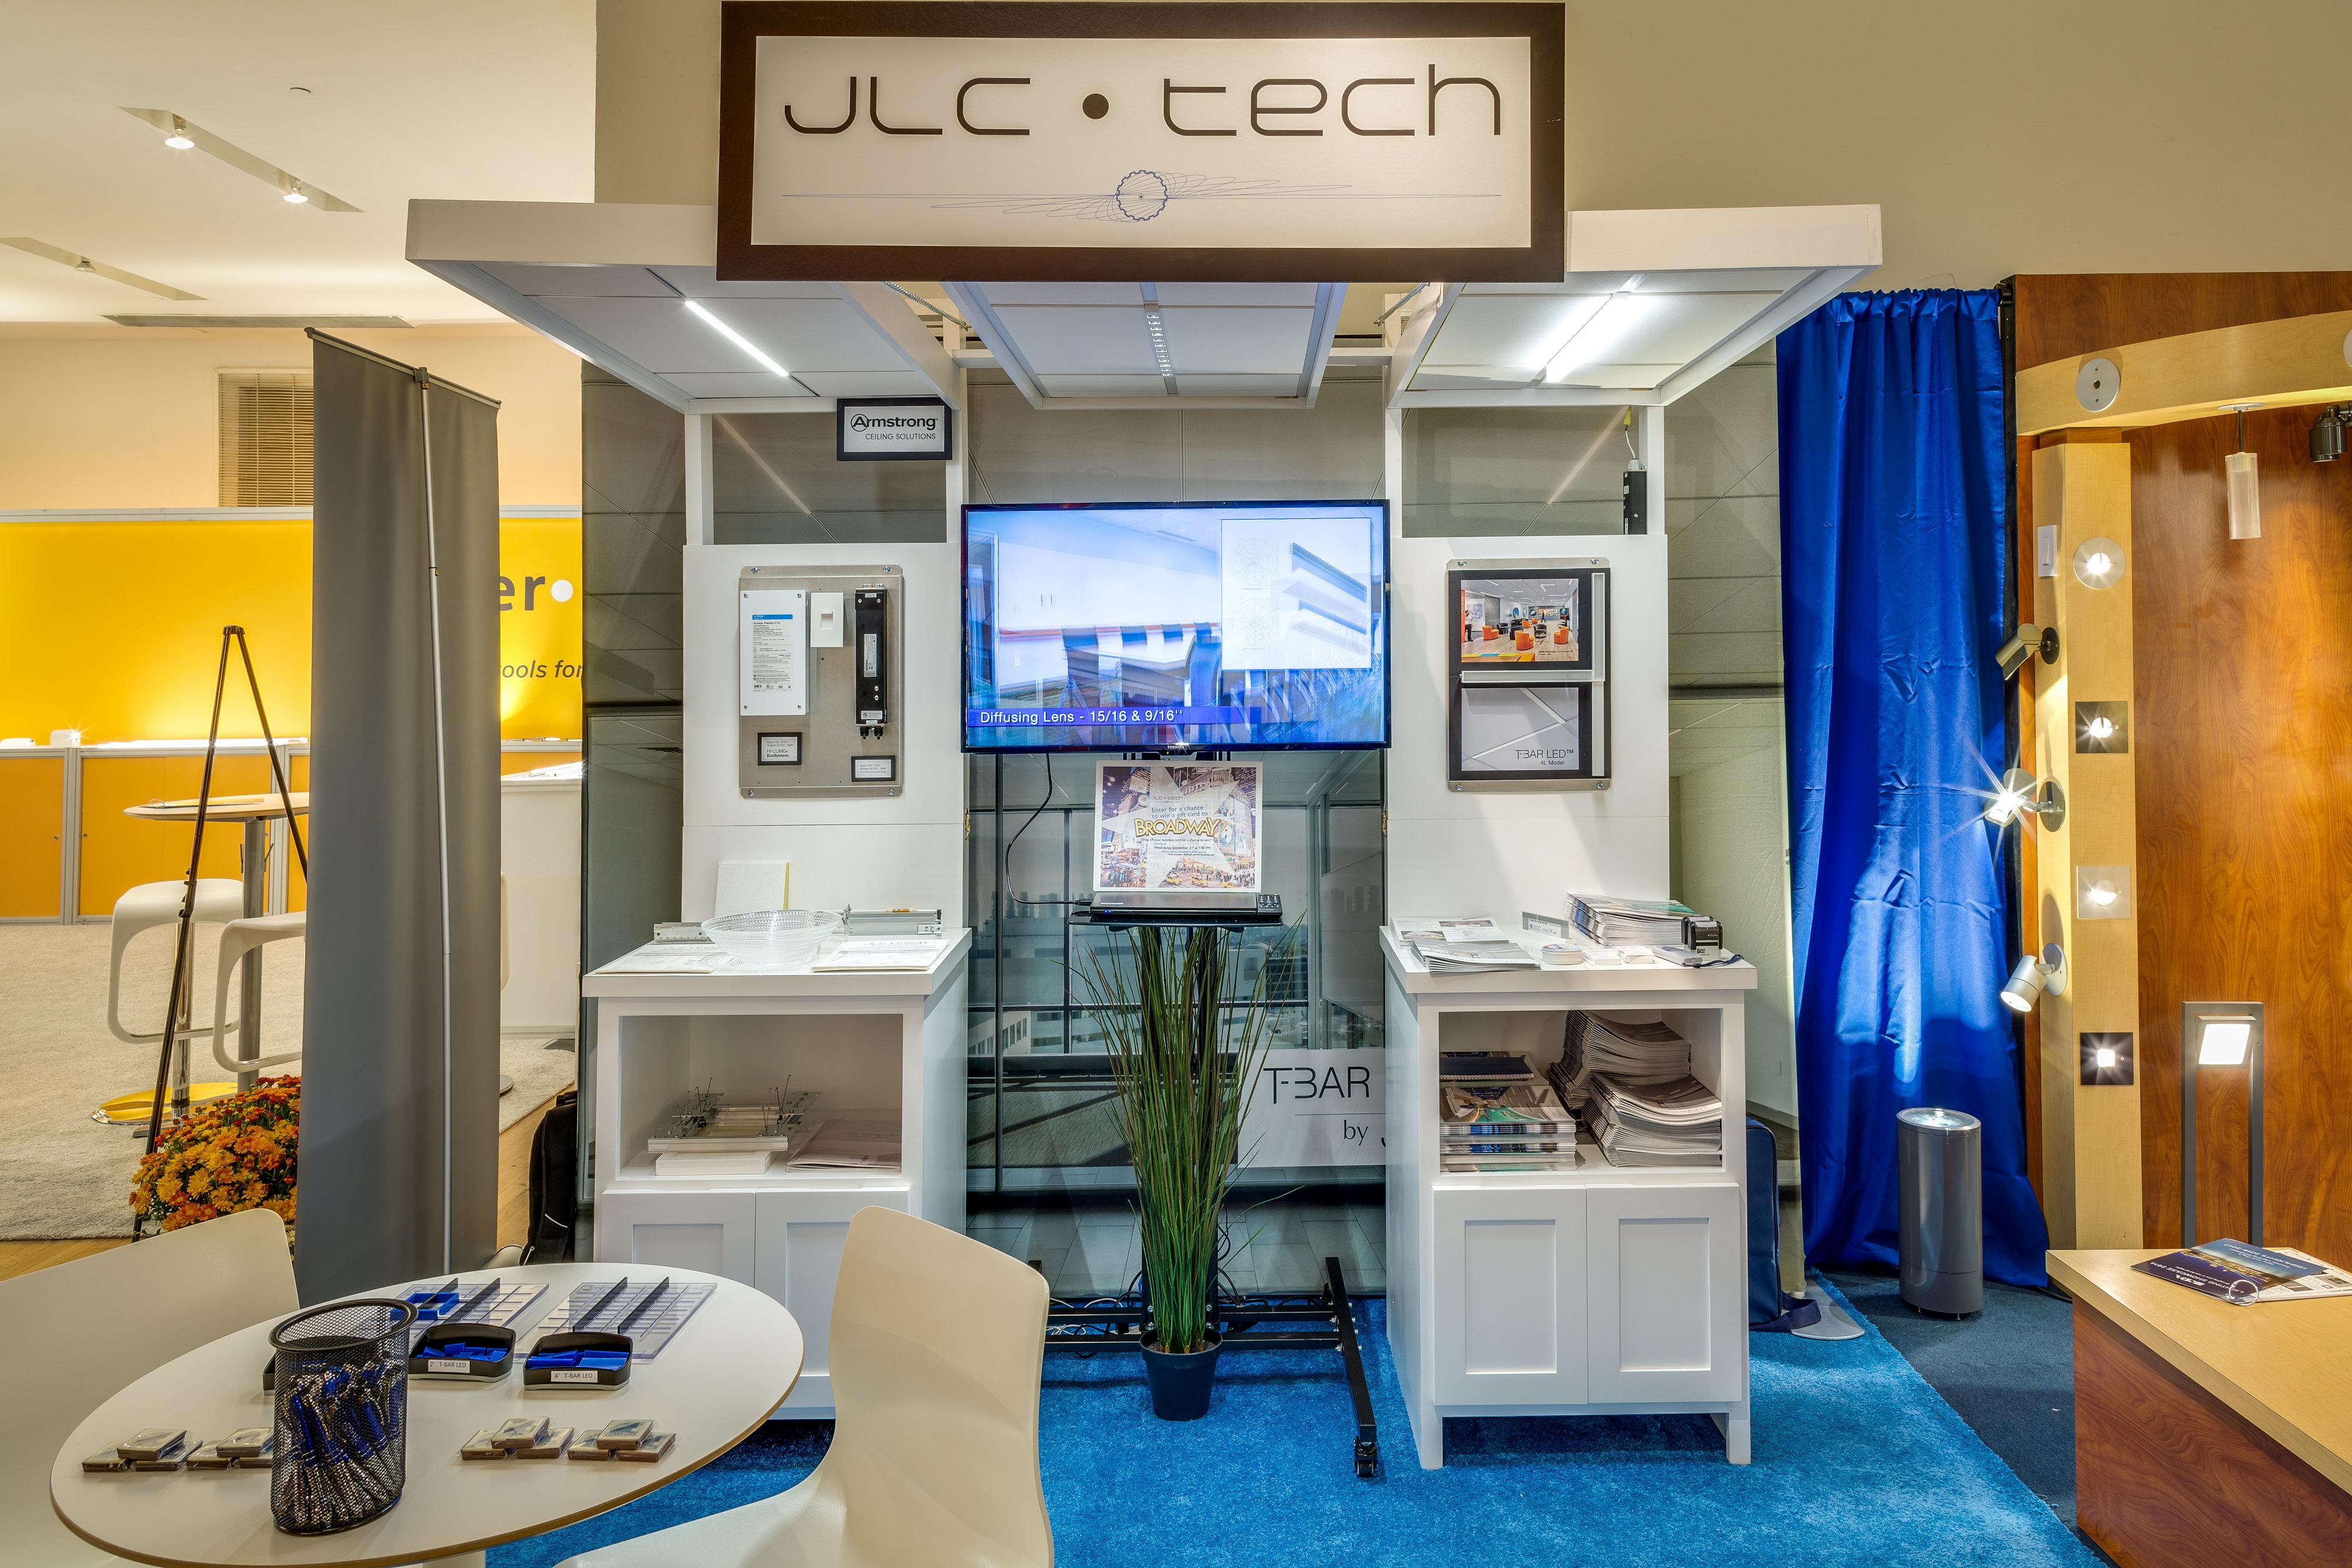 Jlc Tech Lighting Warranty